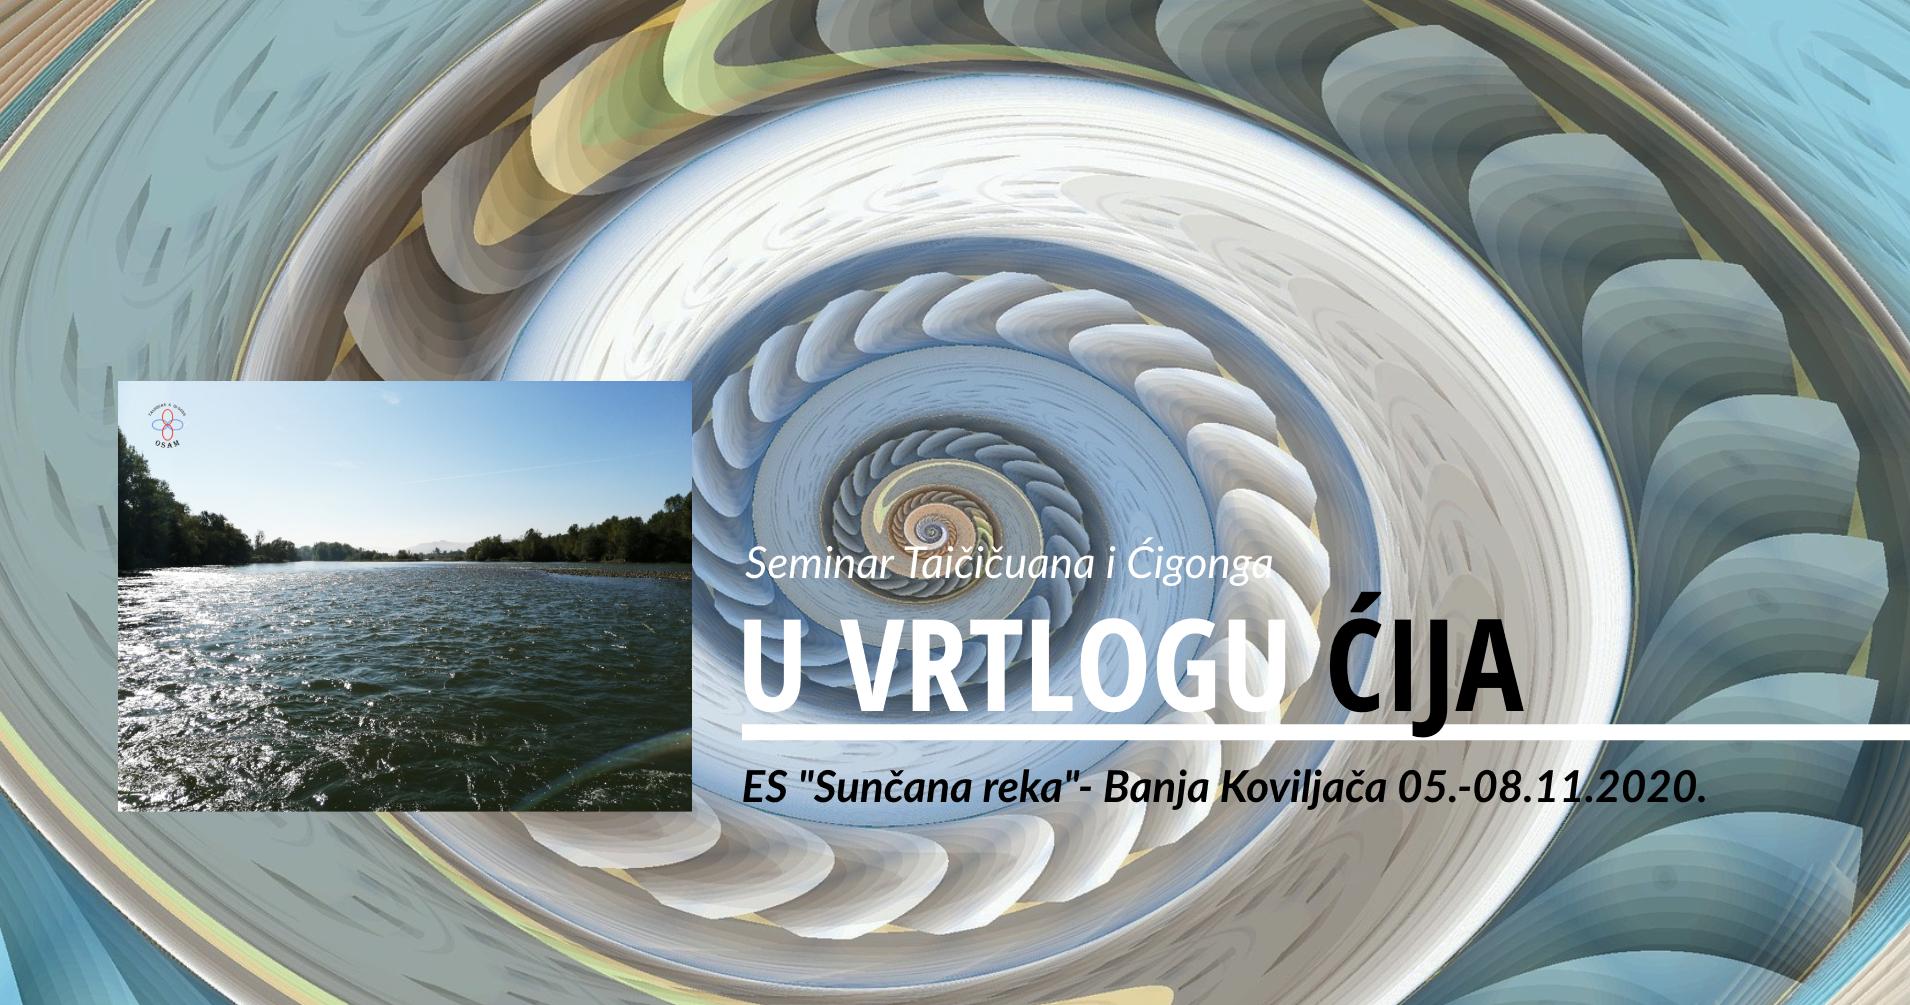 centar-osam-seminar-taicicuana-i-cigonga-u-vrtlogu-cija-suncana-reka